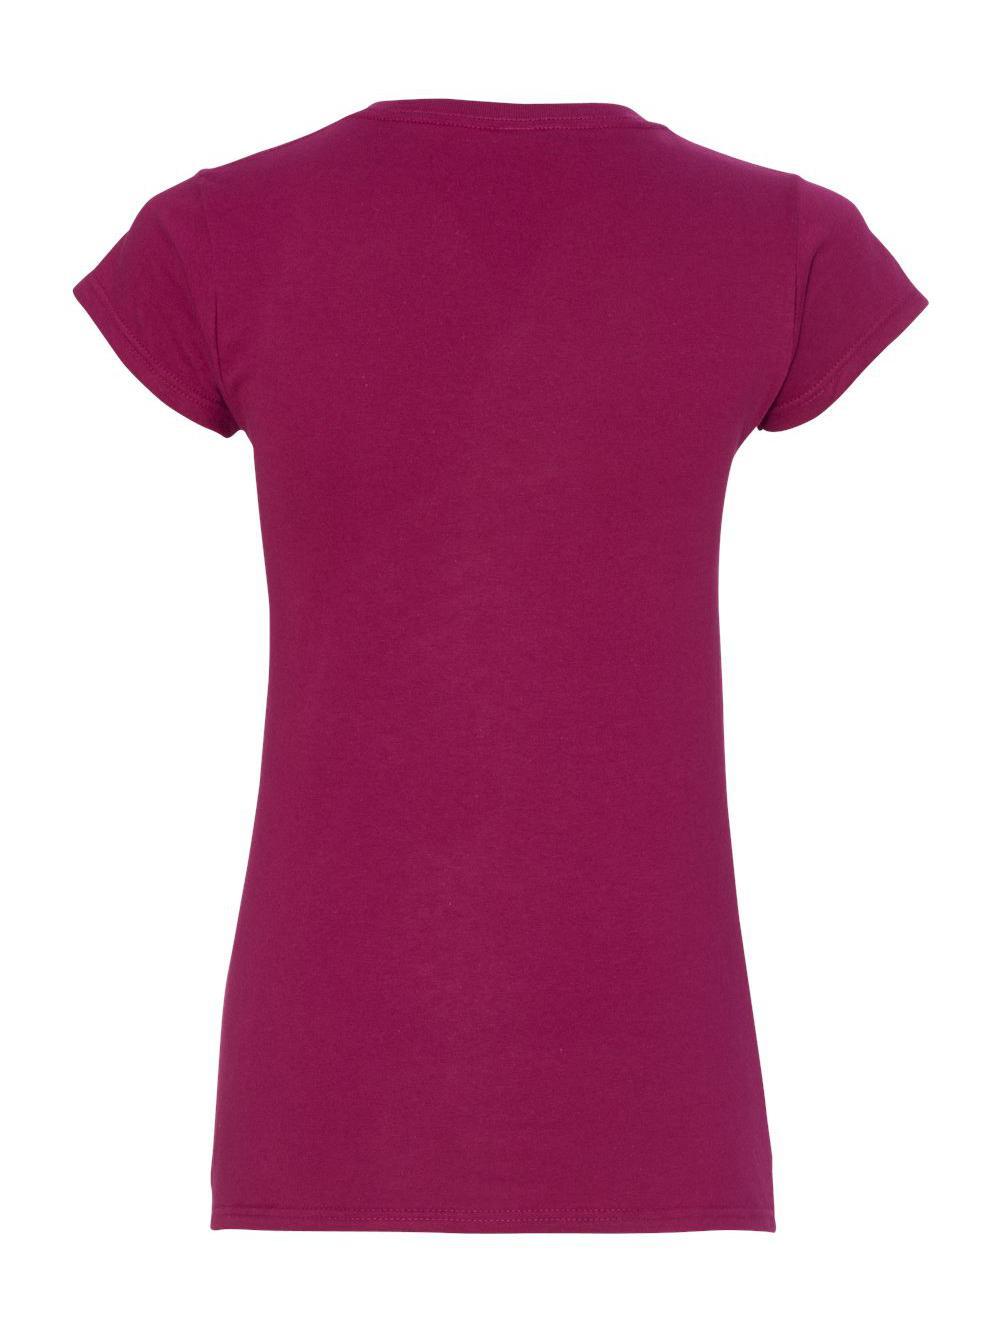 Gildan-Softstyle-Women-039-s-T-Shirt-64000L thumbnail 10